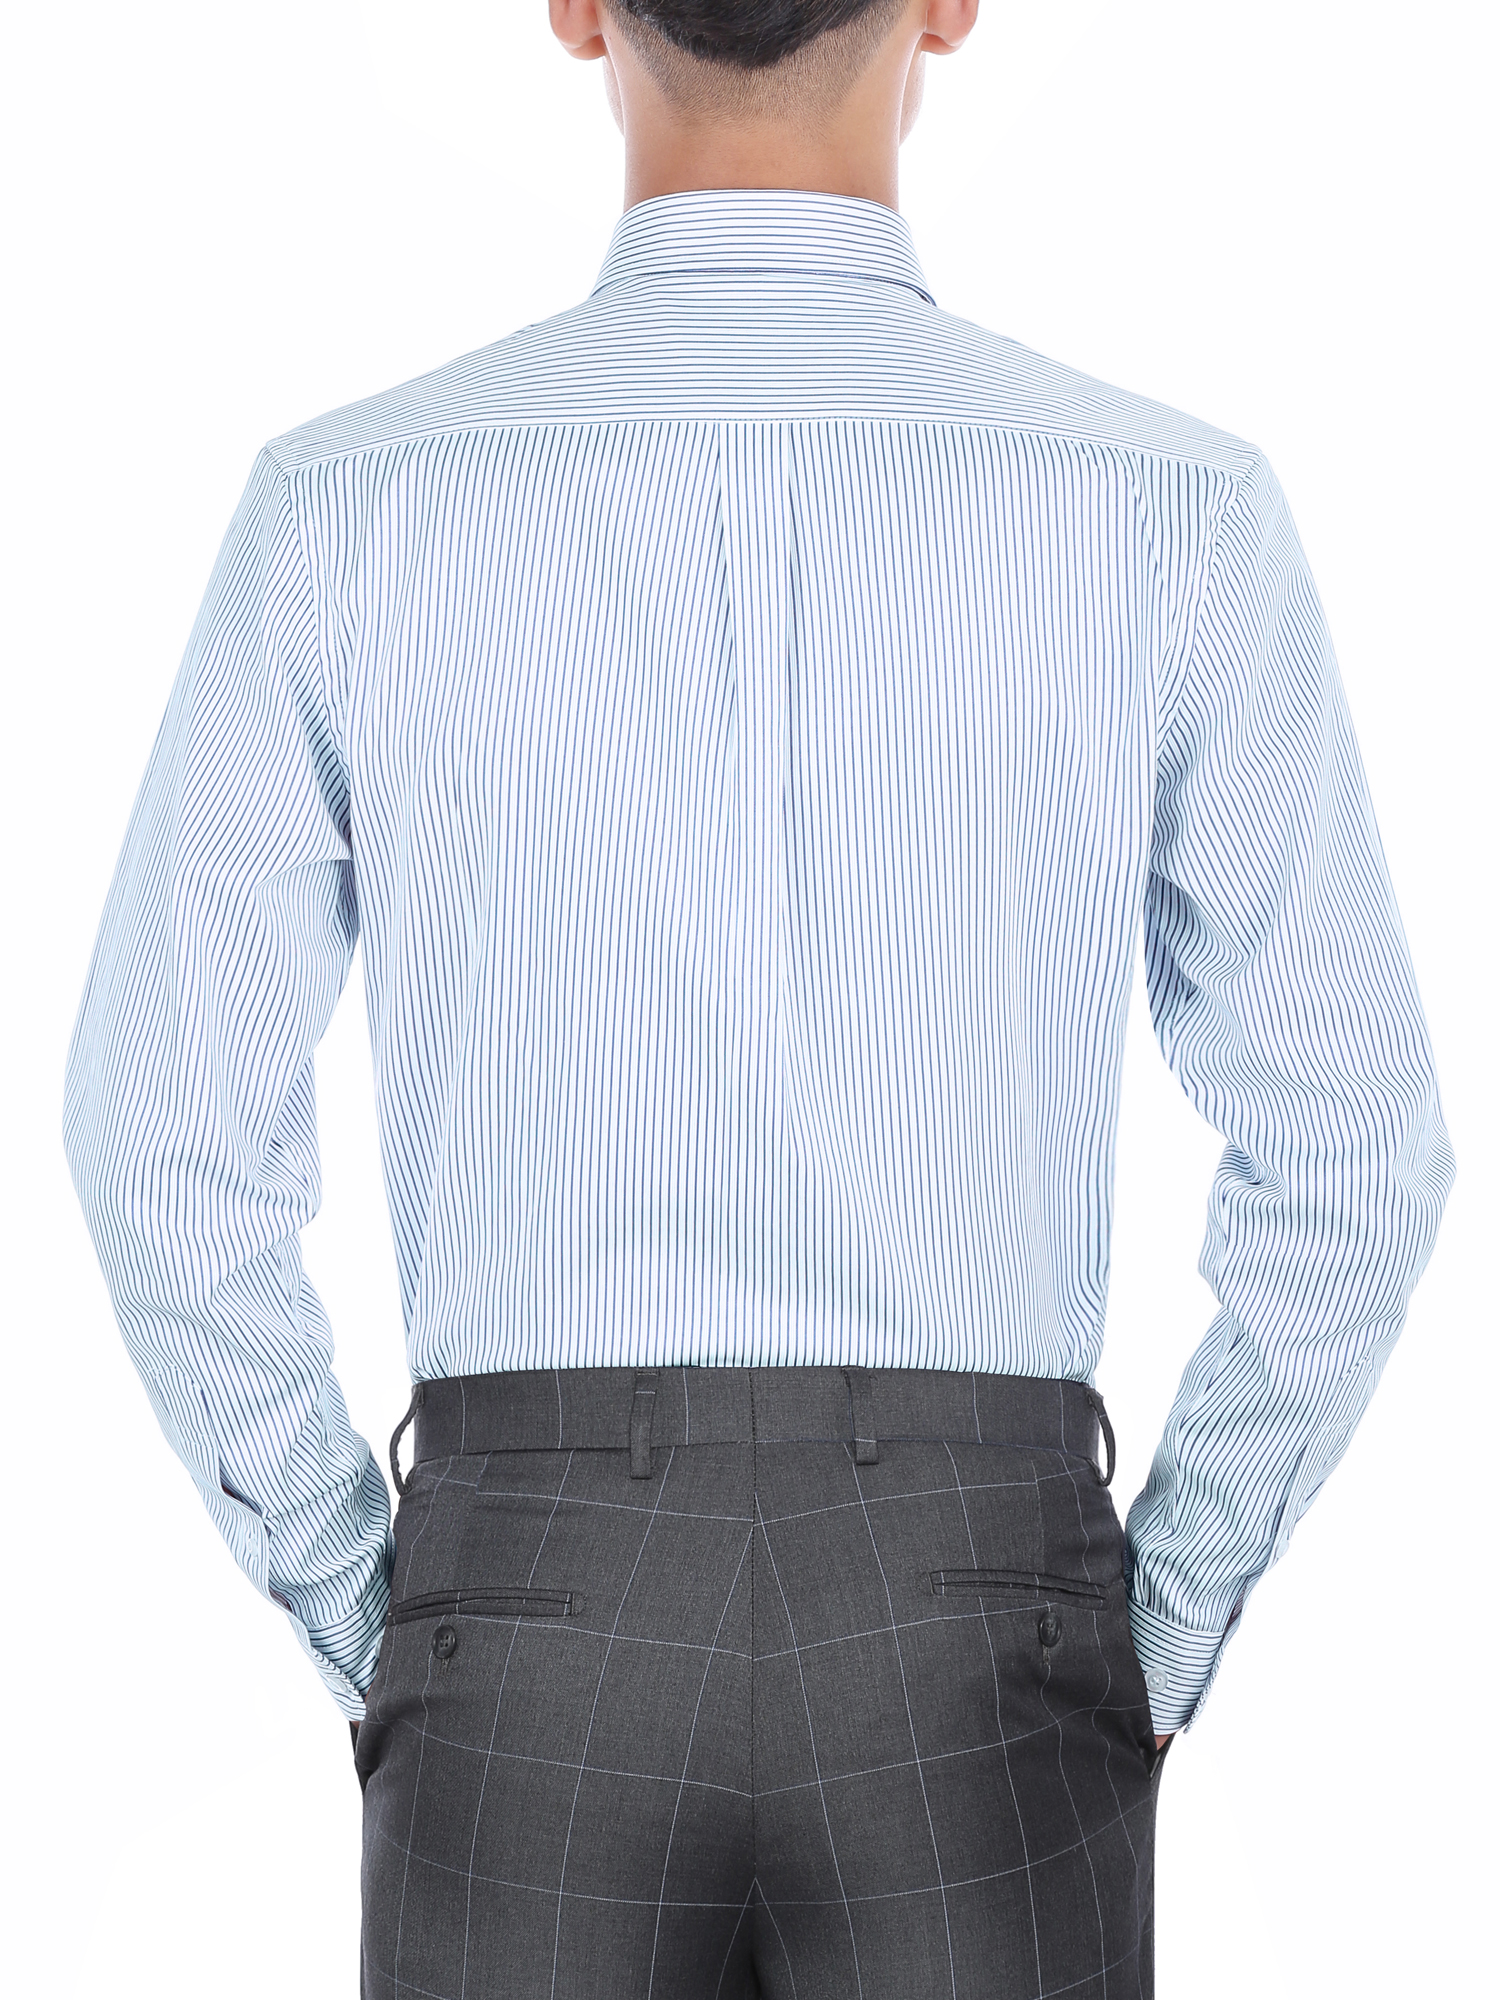 Verno Mens Slim Fit Long Sleeve Blue And White Stripe Dress Shirt